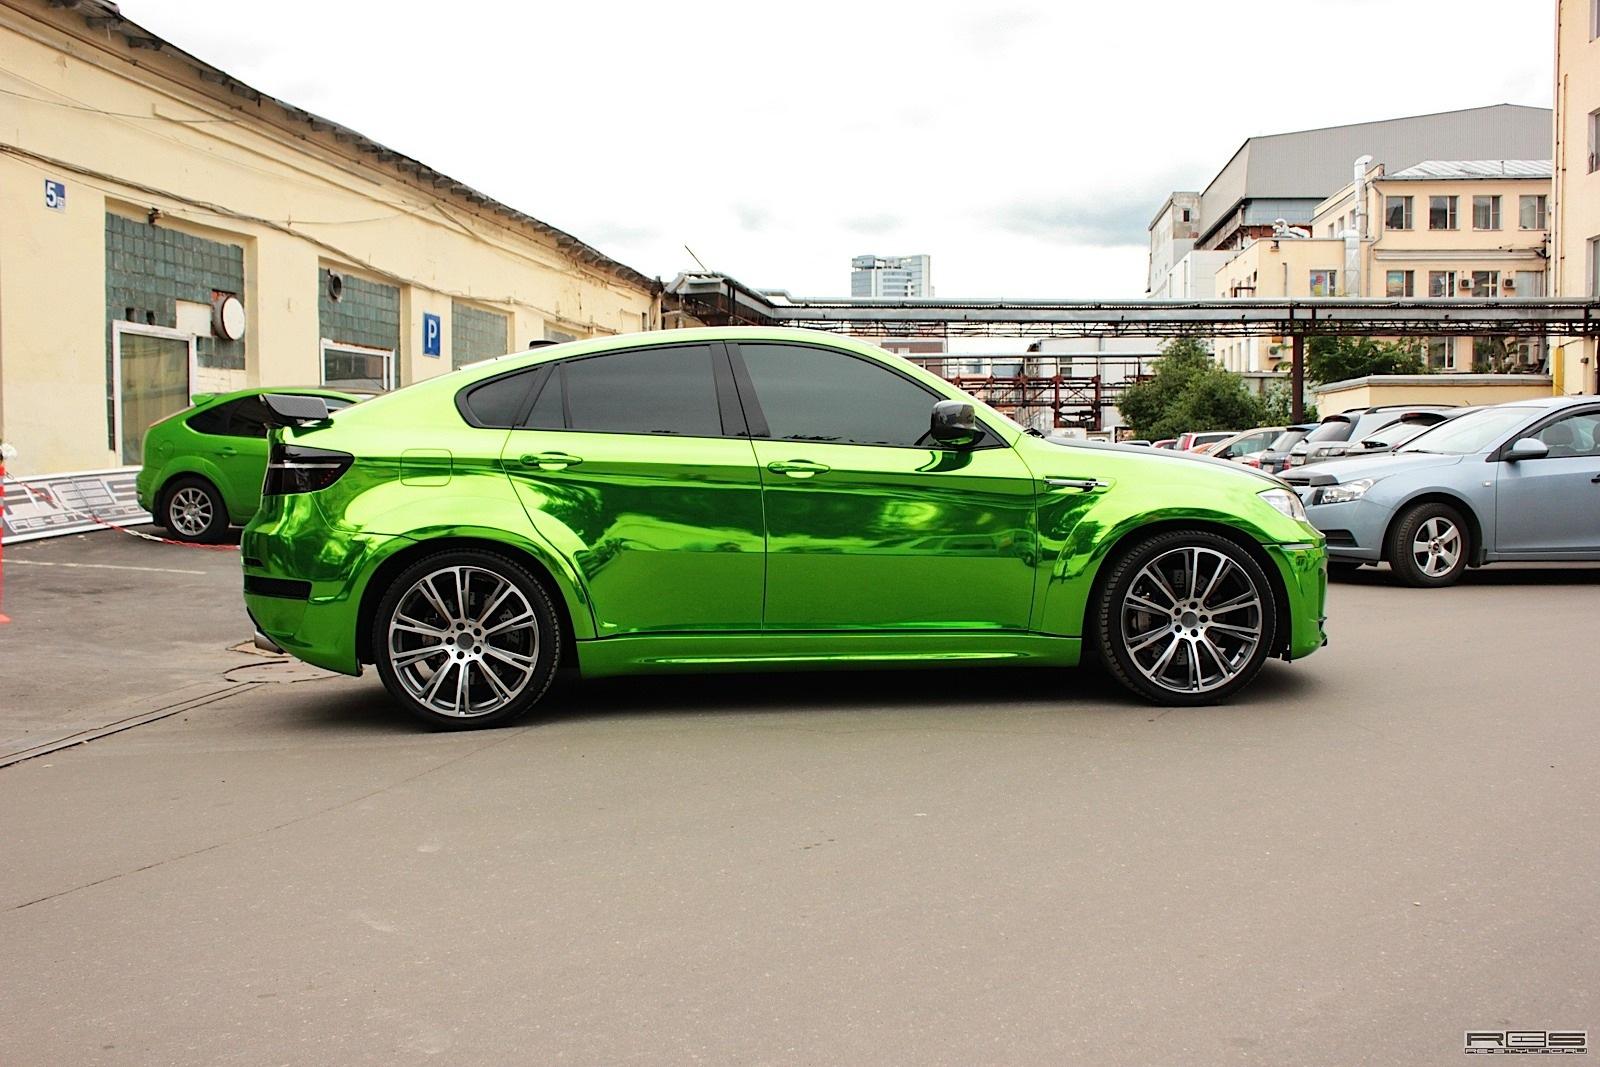 Hulk BMW X6 M